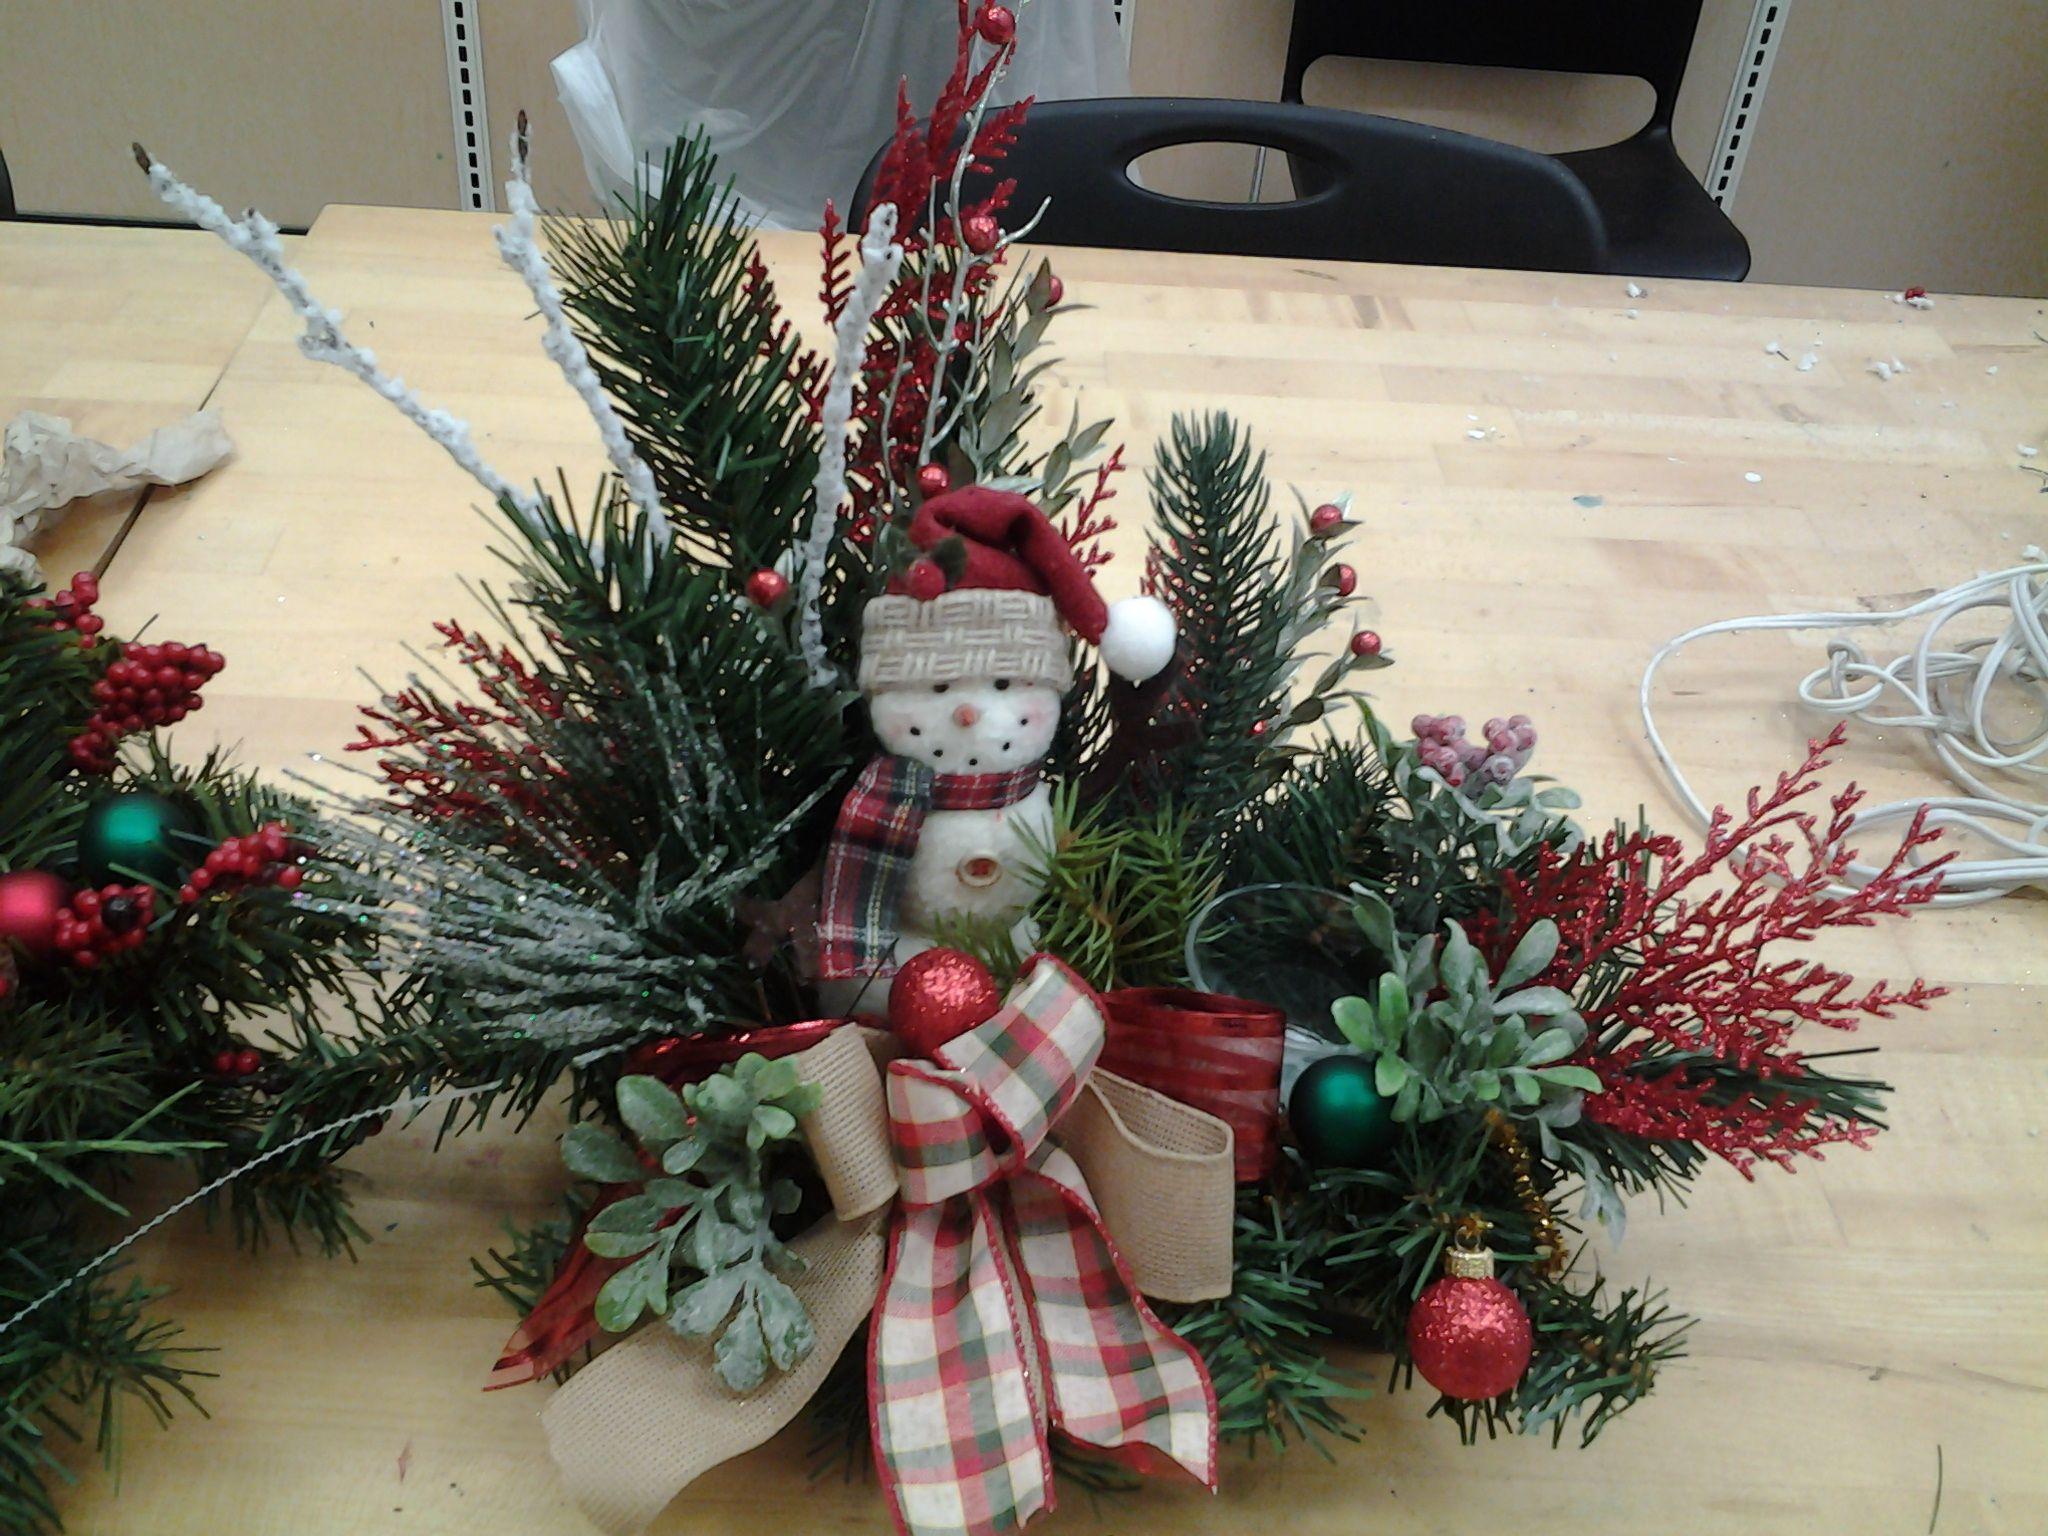 Snowman Tabletopcindy 2717 Christmas Floral Arrangementschristmas Centerpiecesfloral Centerpiecestable Centerpiecesdiy